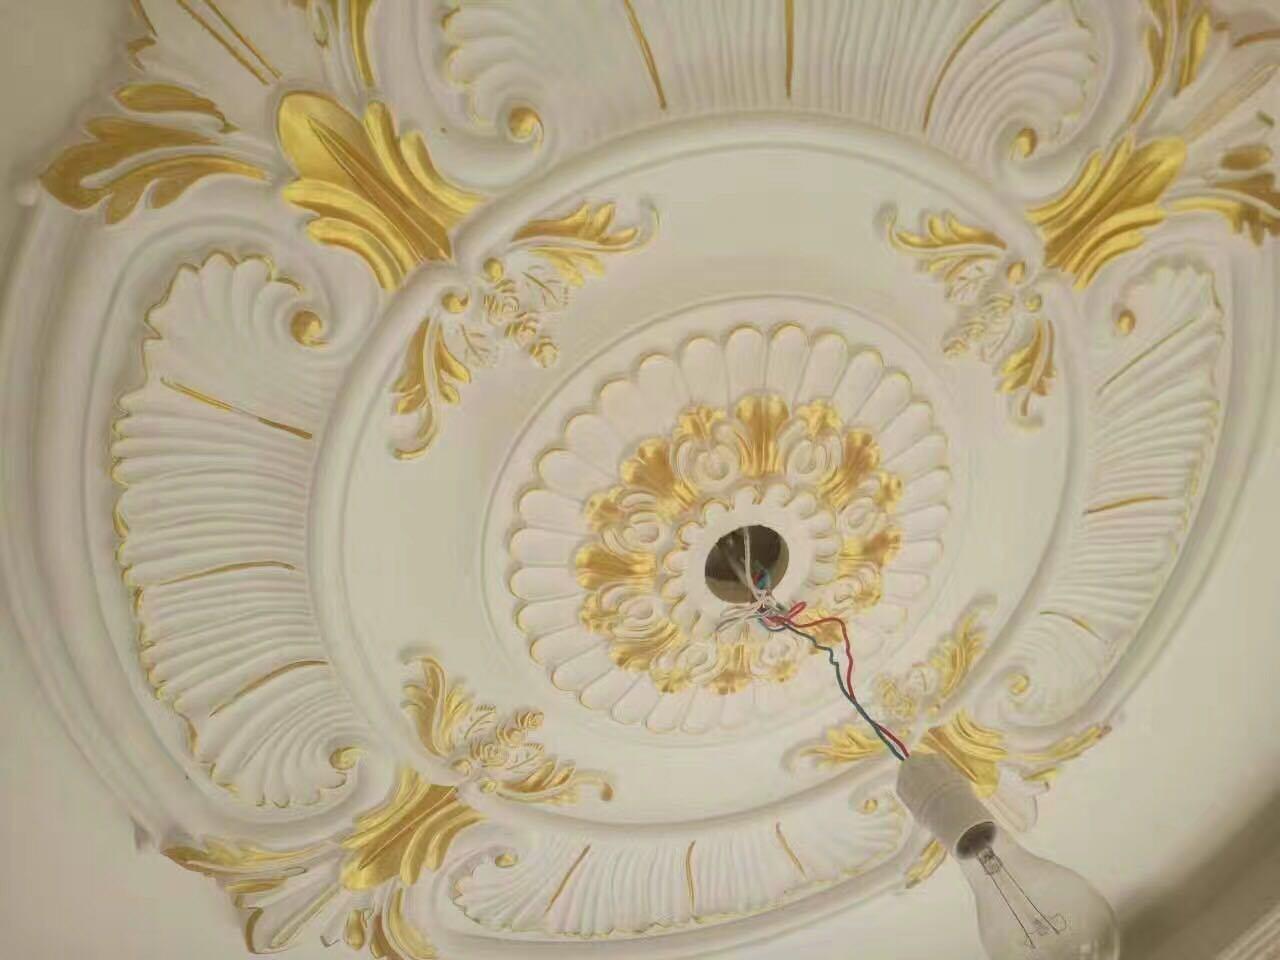 Golden PU (polyurethane) Foam Material PU Medallion for Ceiling Decoration